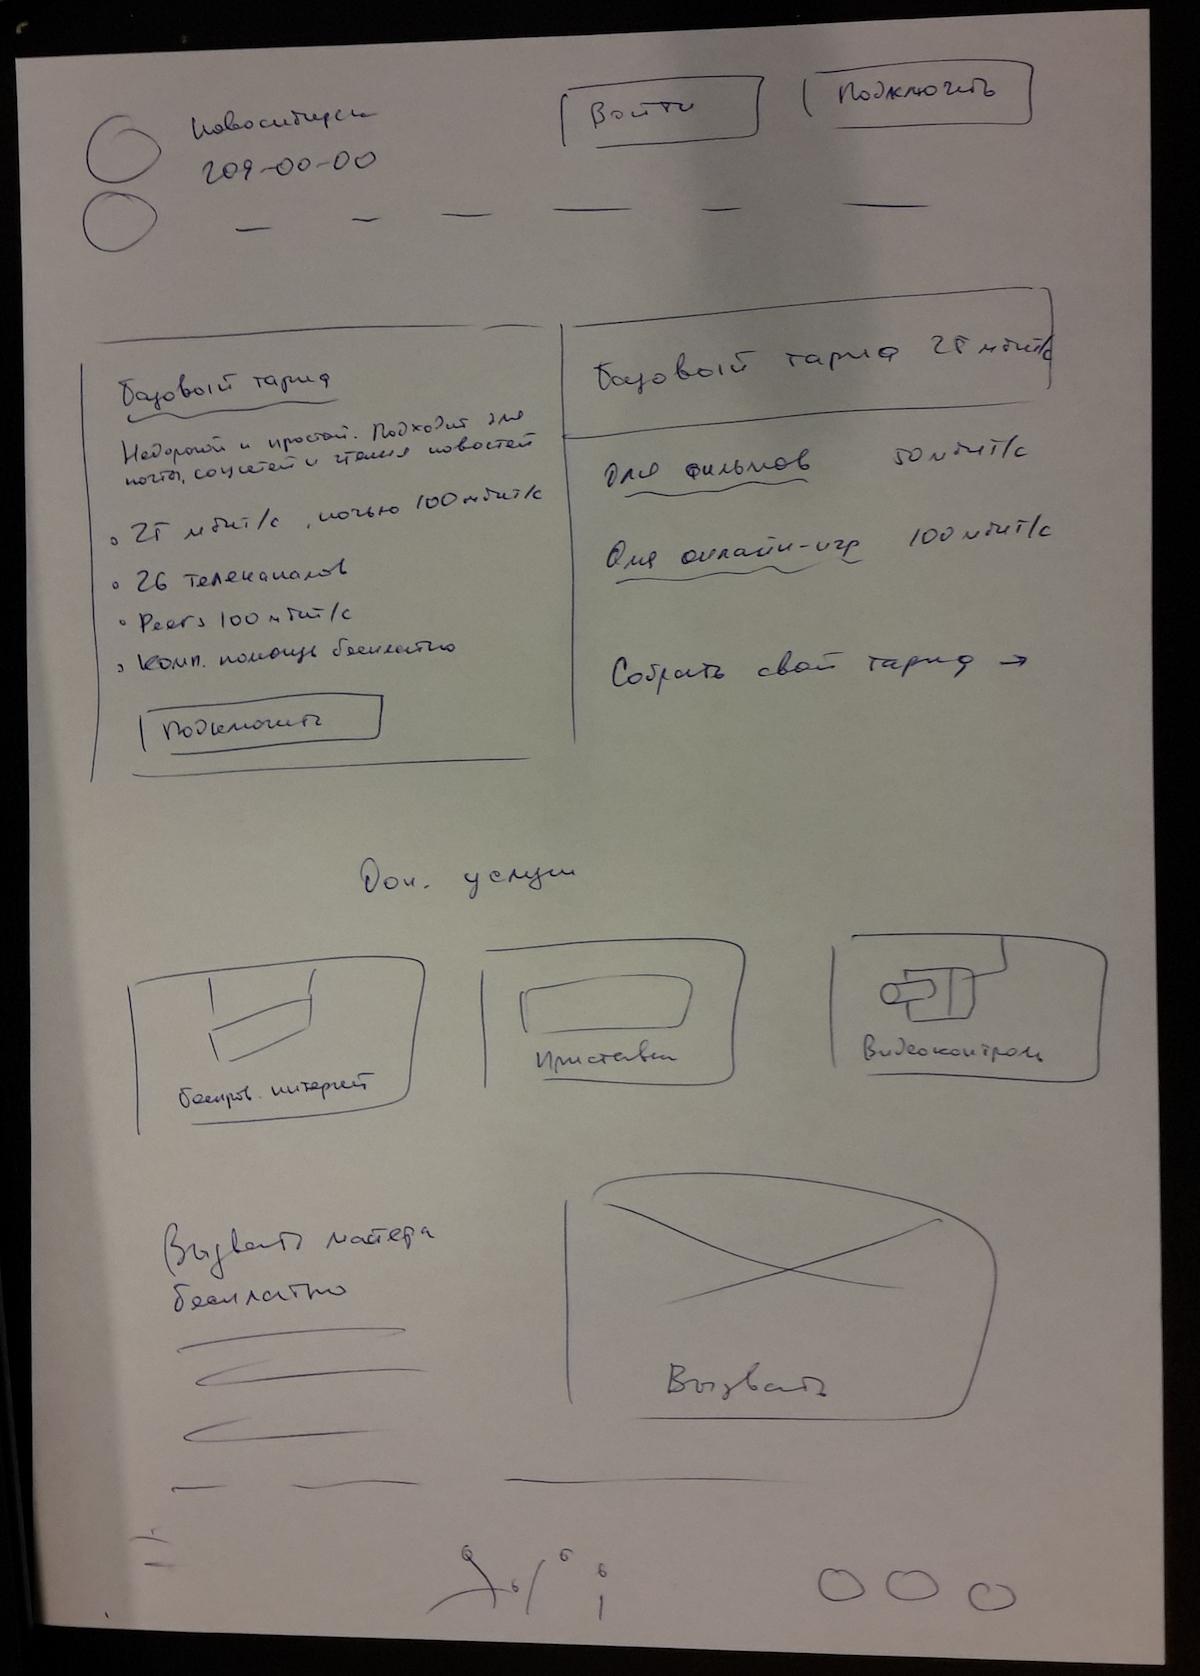 SobakaPav.ru | Первые попытки создания wireframe